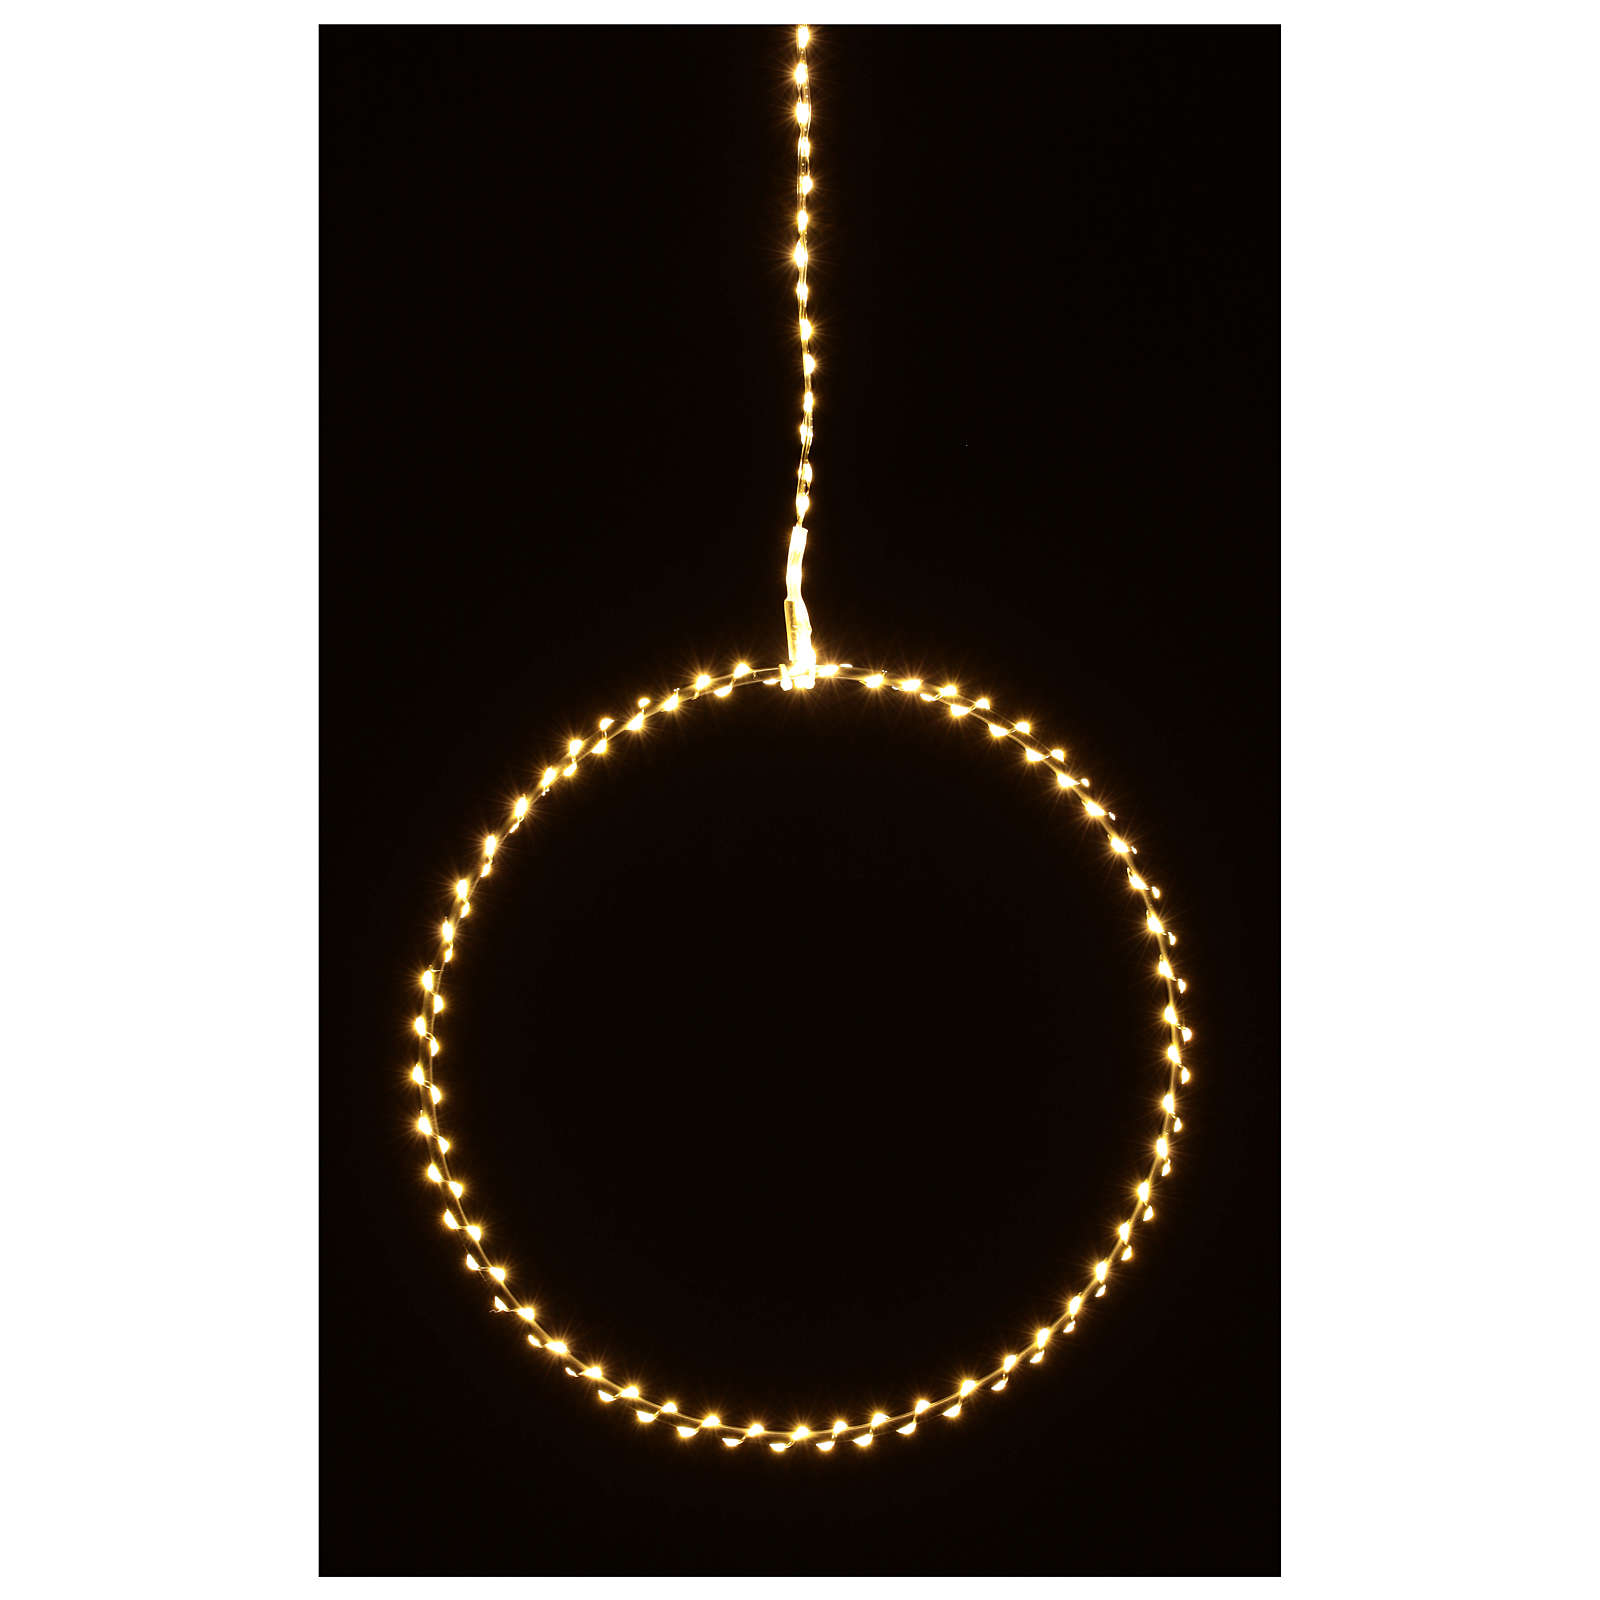 Anello luminoso natalizia gocce led bianco caldo d. 30 cm interni 220V 3